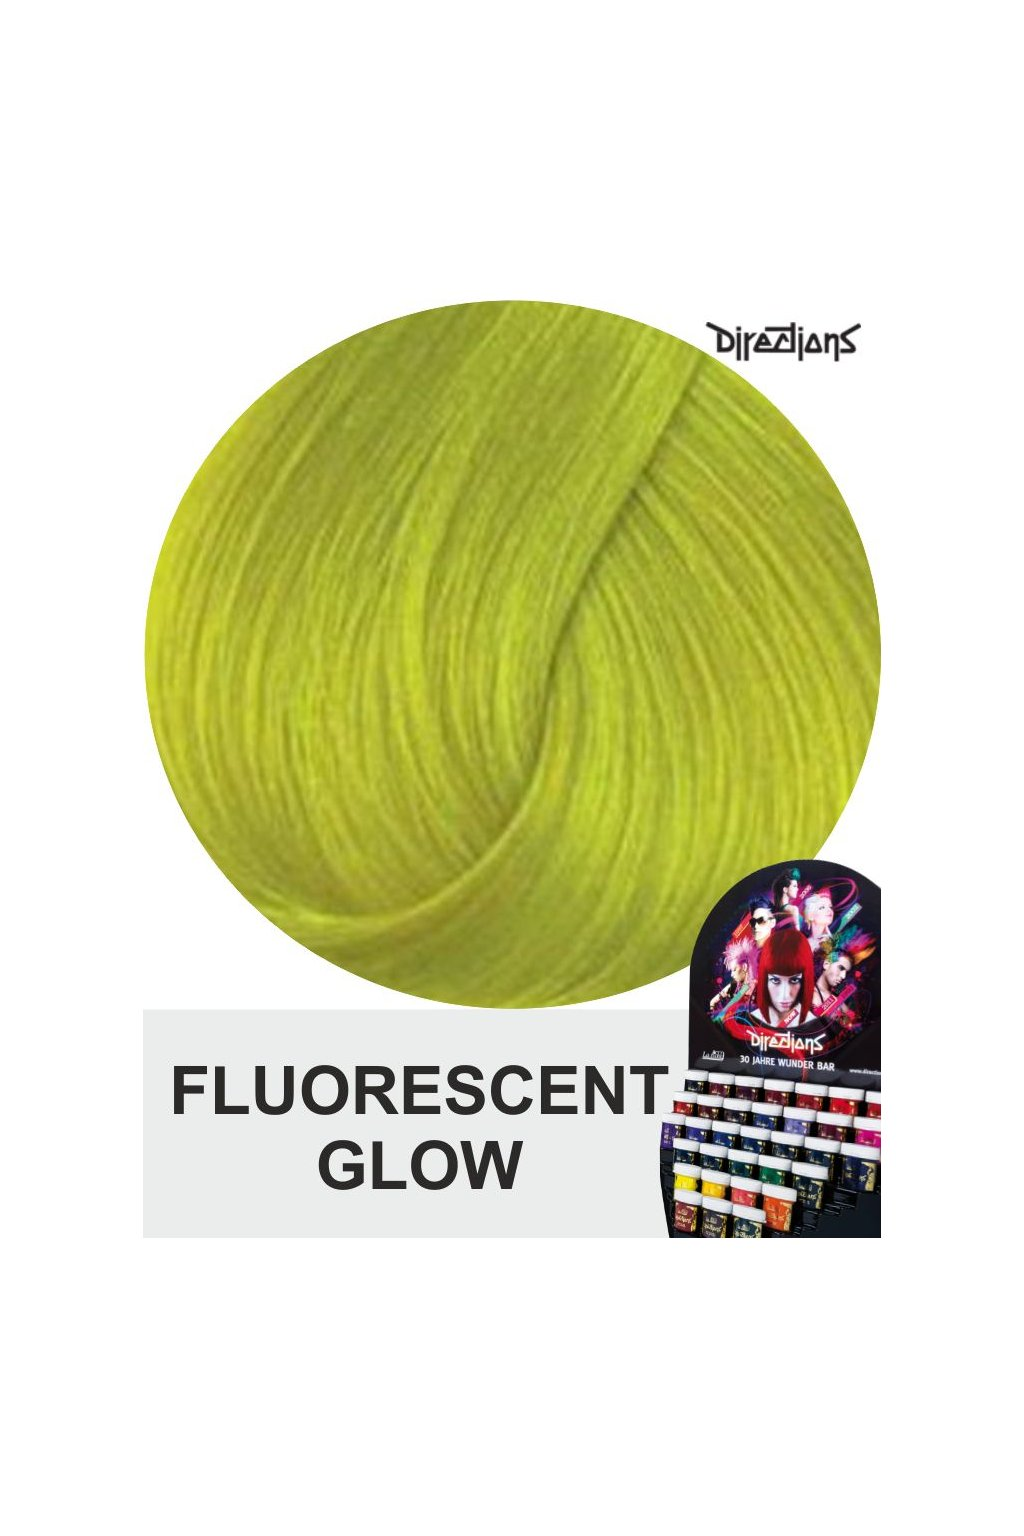 Fluorescent Glow